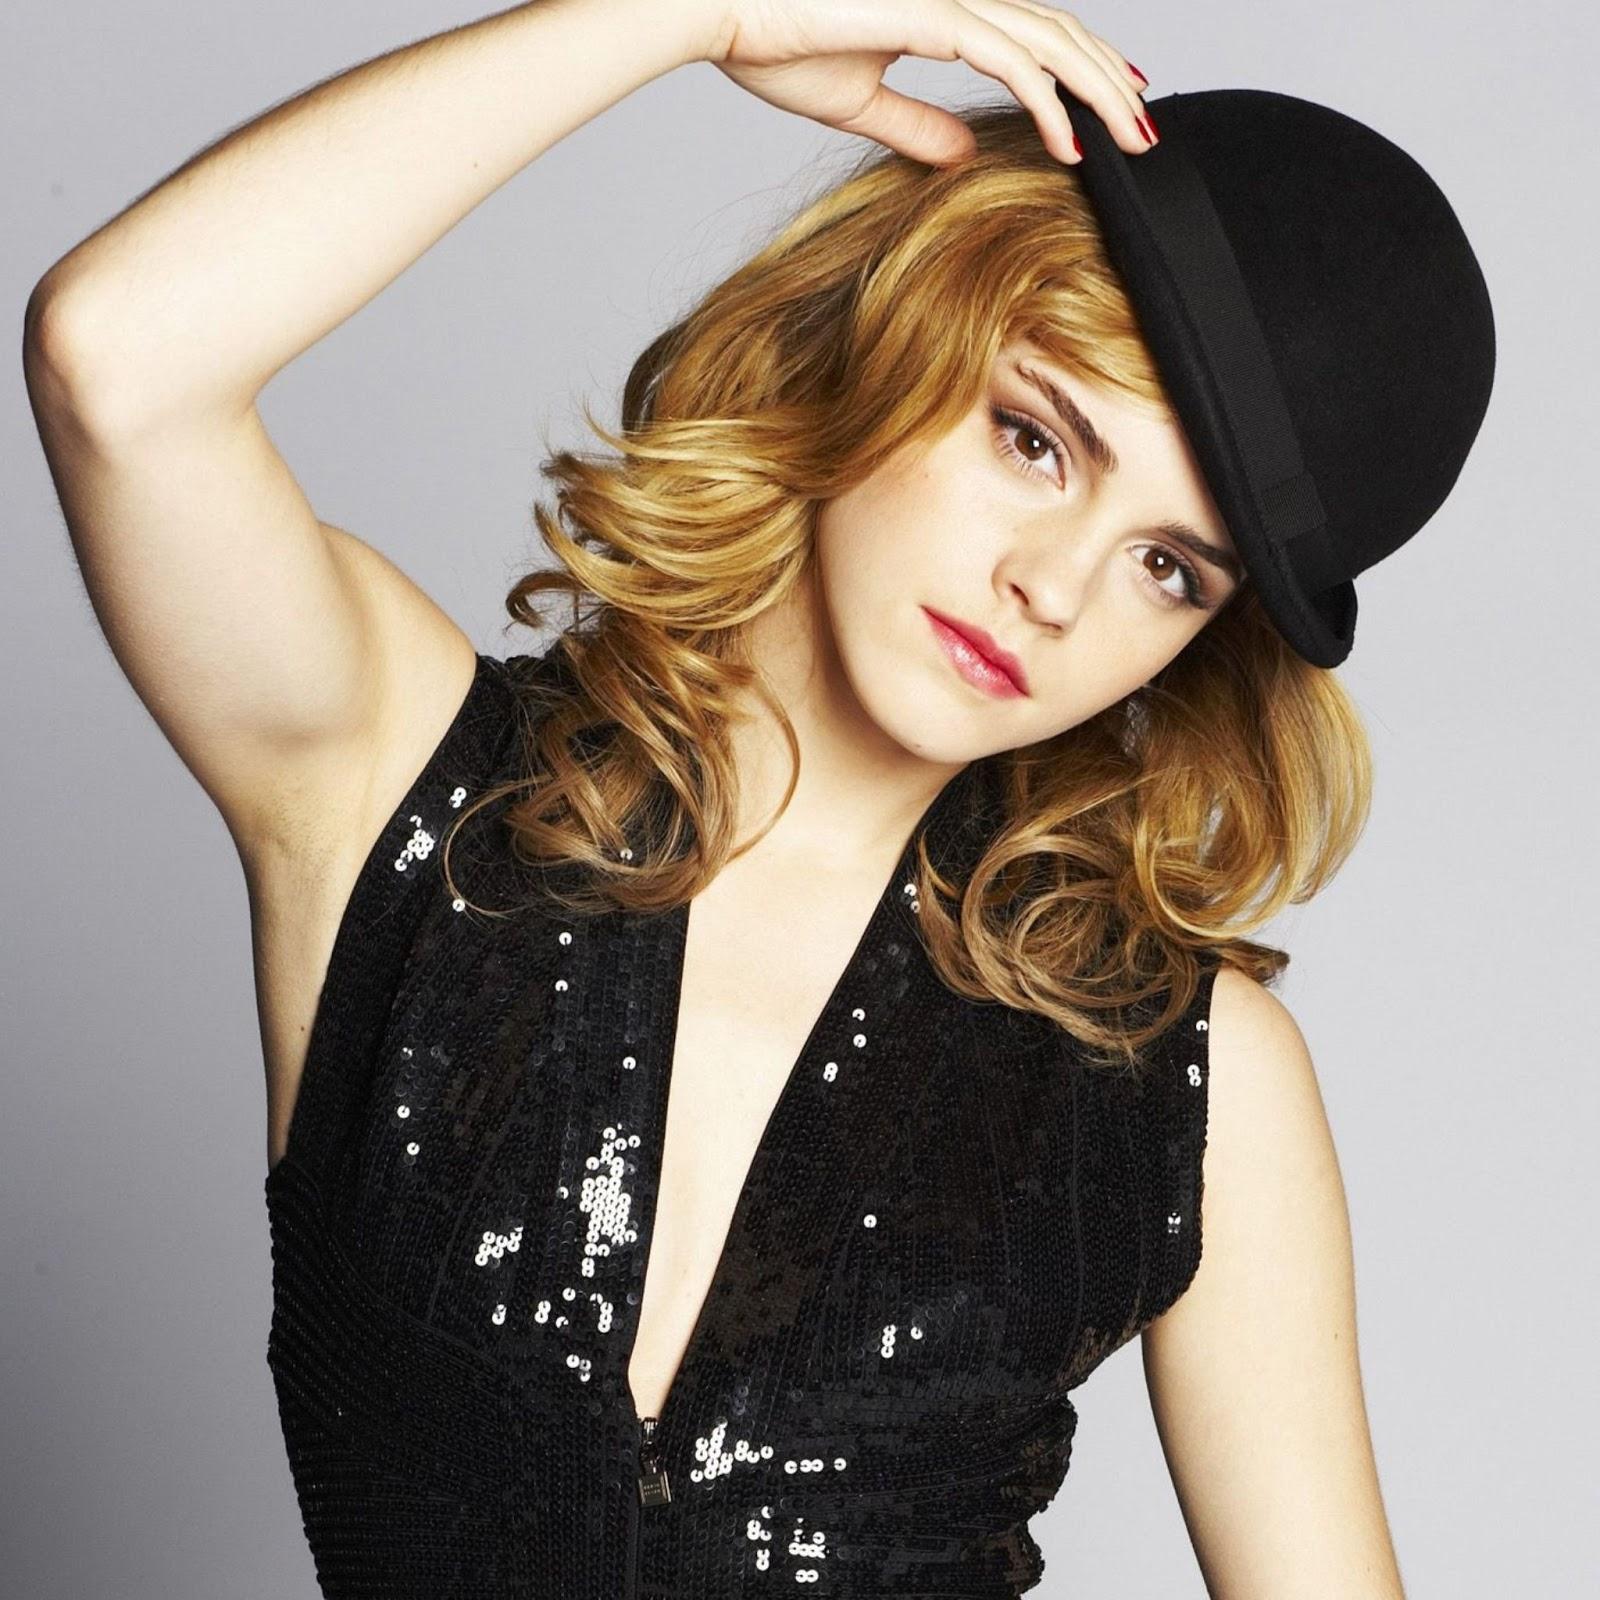 http://3.bp.blogspot.com/-1Lq7s4G1HKA/USZGAMUOZEI/AAAAAAAADz4/MNHwKGj7cb4/s1600/Emma+Watson++New+Picture+2013+14.jpg